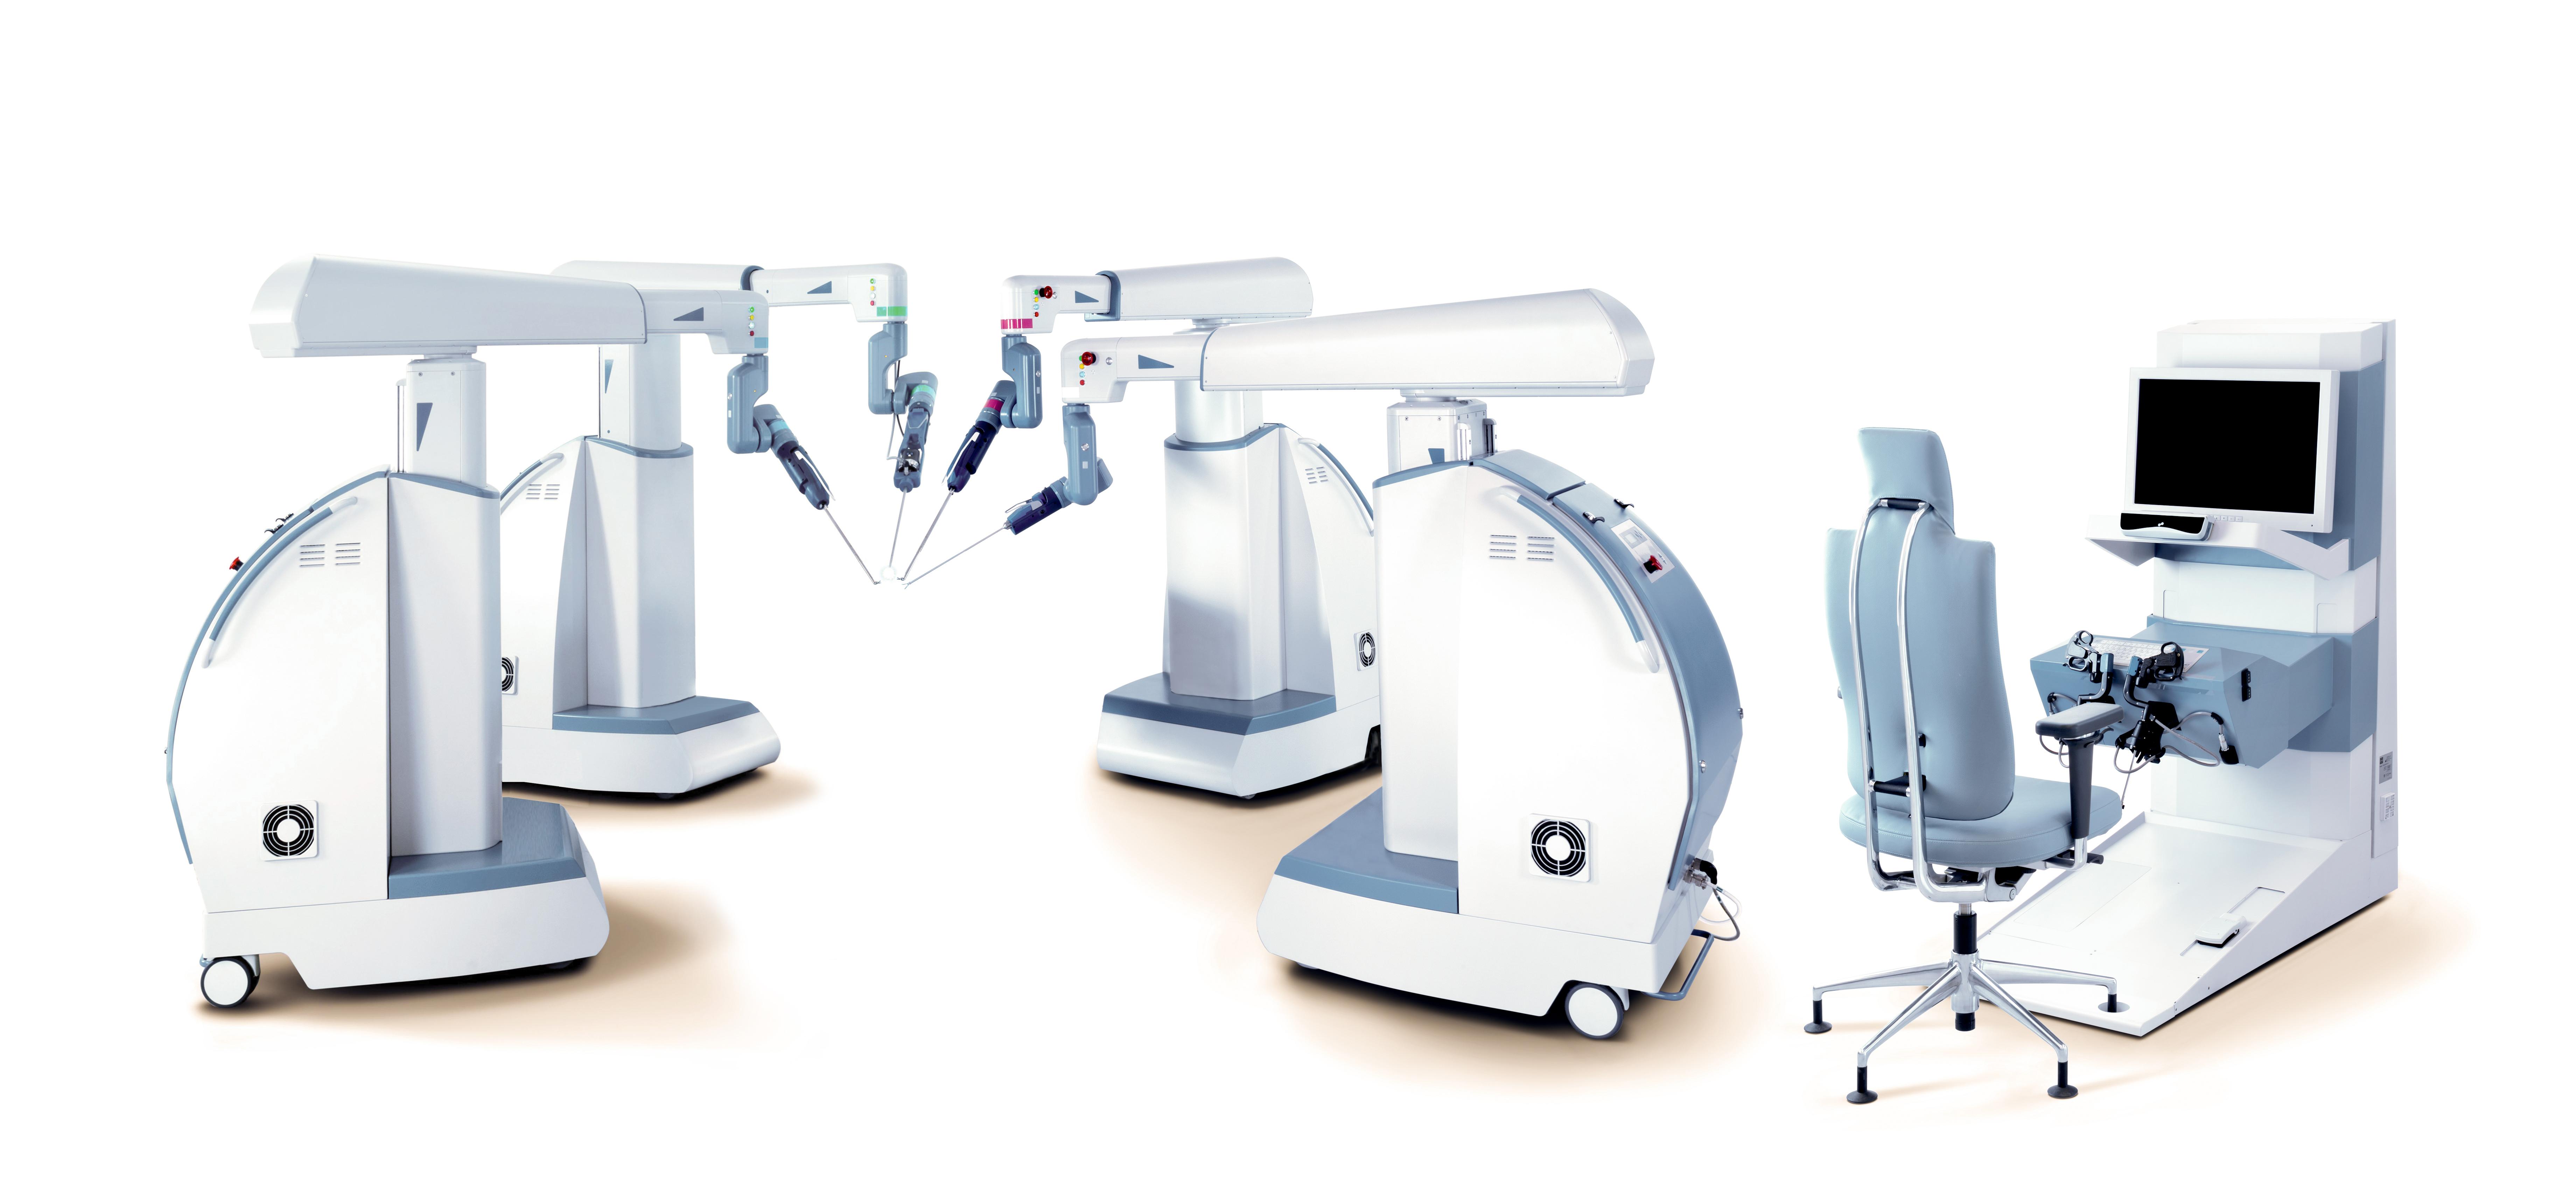 The Senhance robotic surgery system from TransEnterix